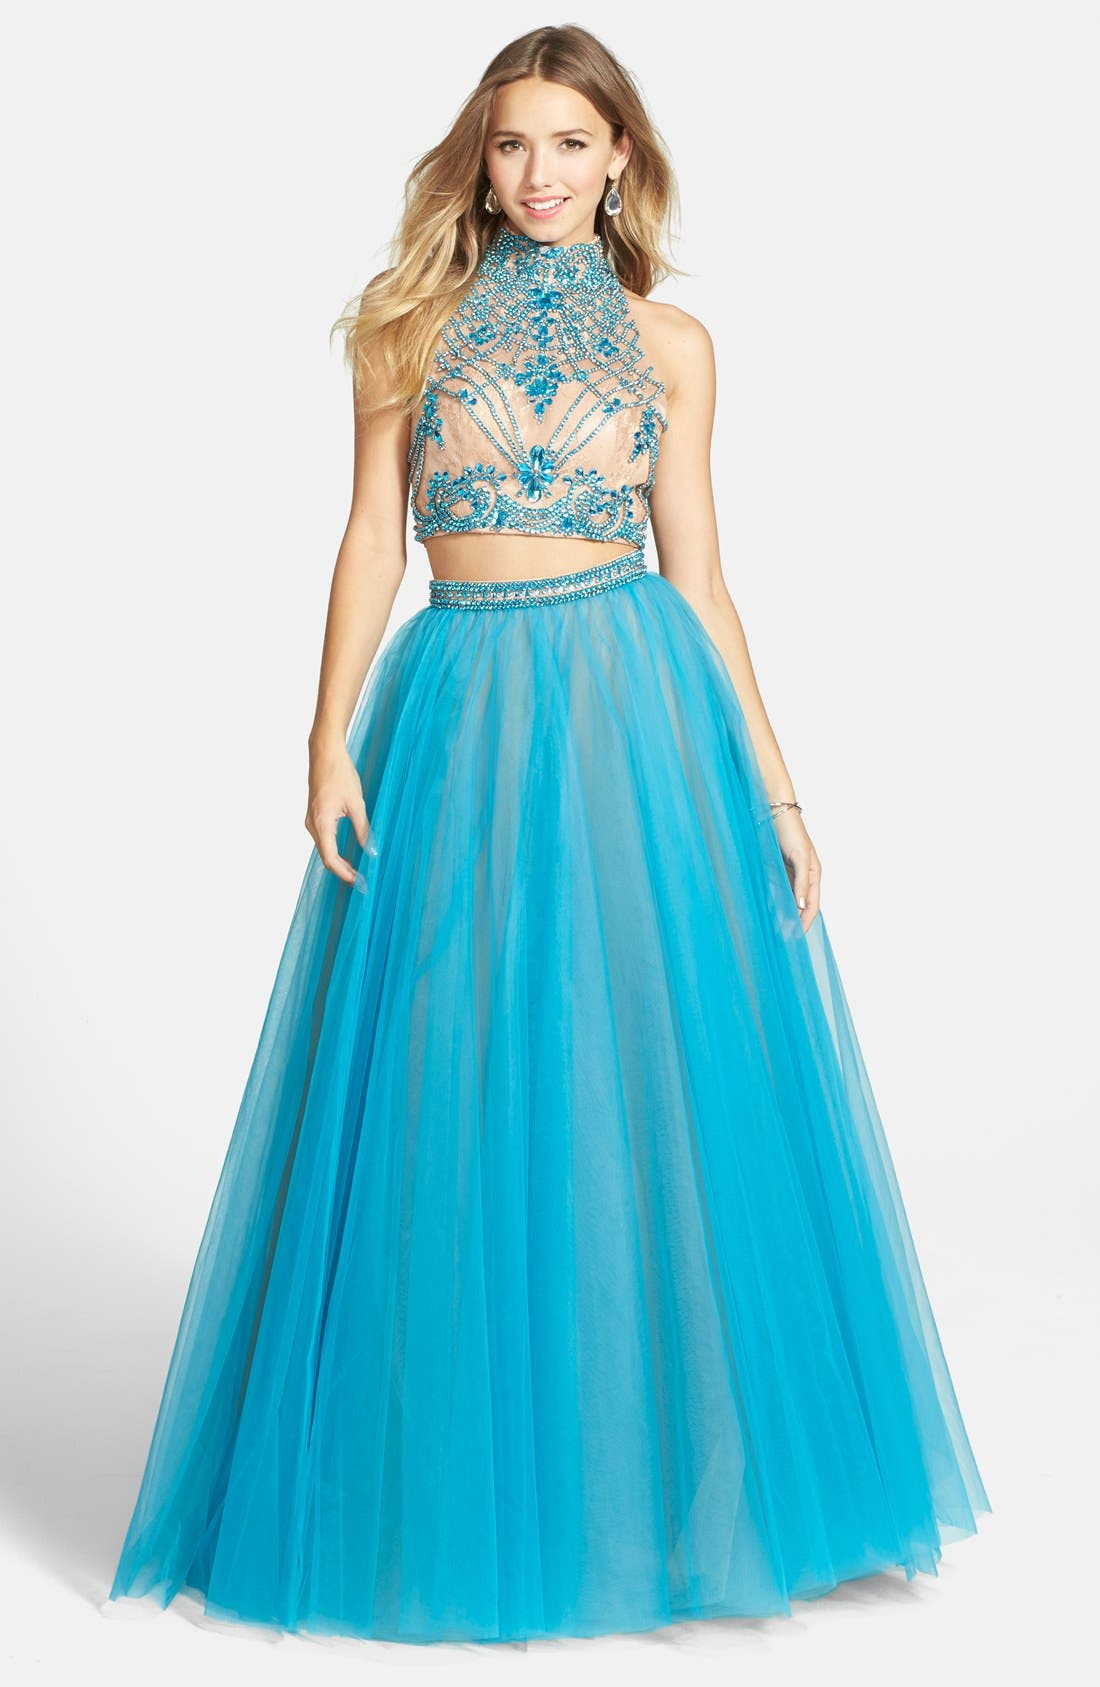 Alternate Image 1 Selected - Sherri Hill Embellished Lace Crop Halter Tank & Chiffon Skirt